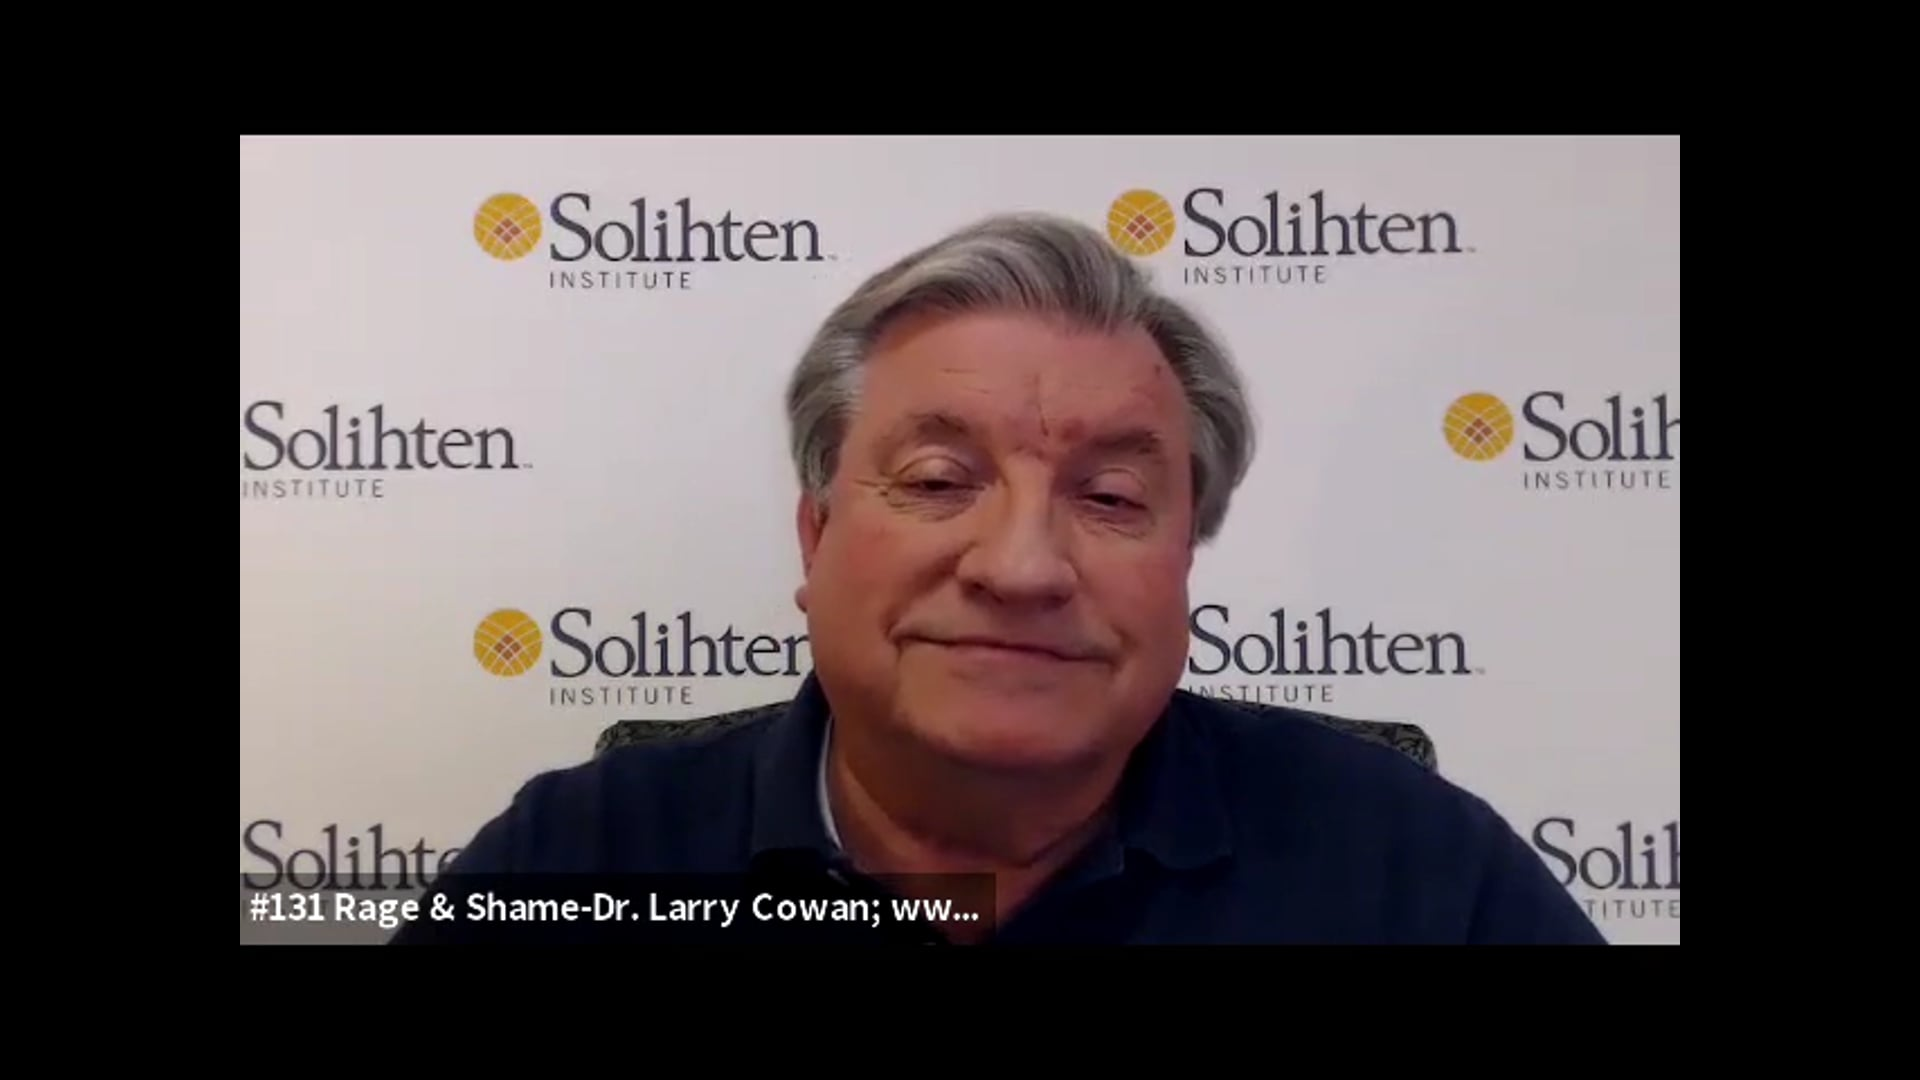 Dr. Larry Cowan, DMin, LMFT